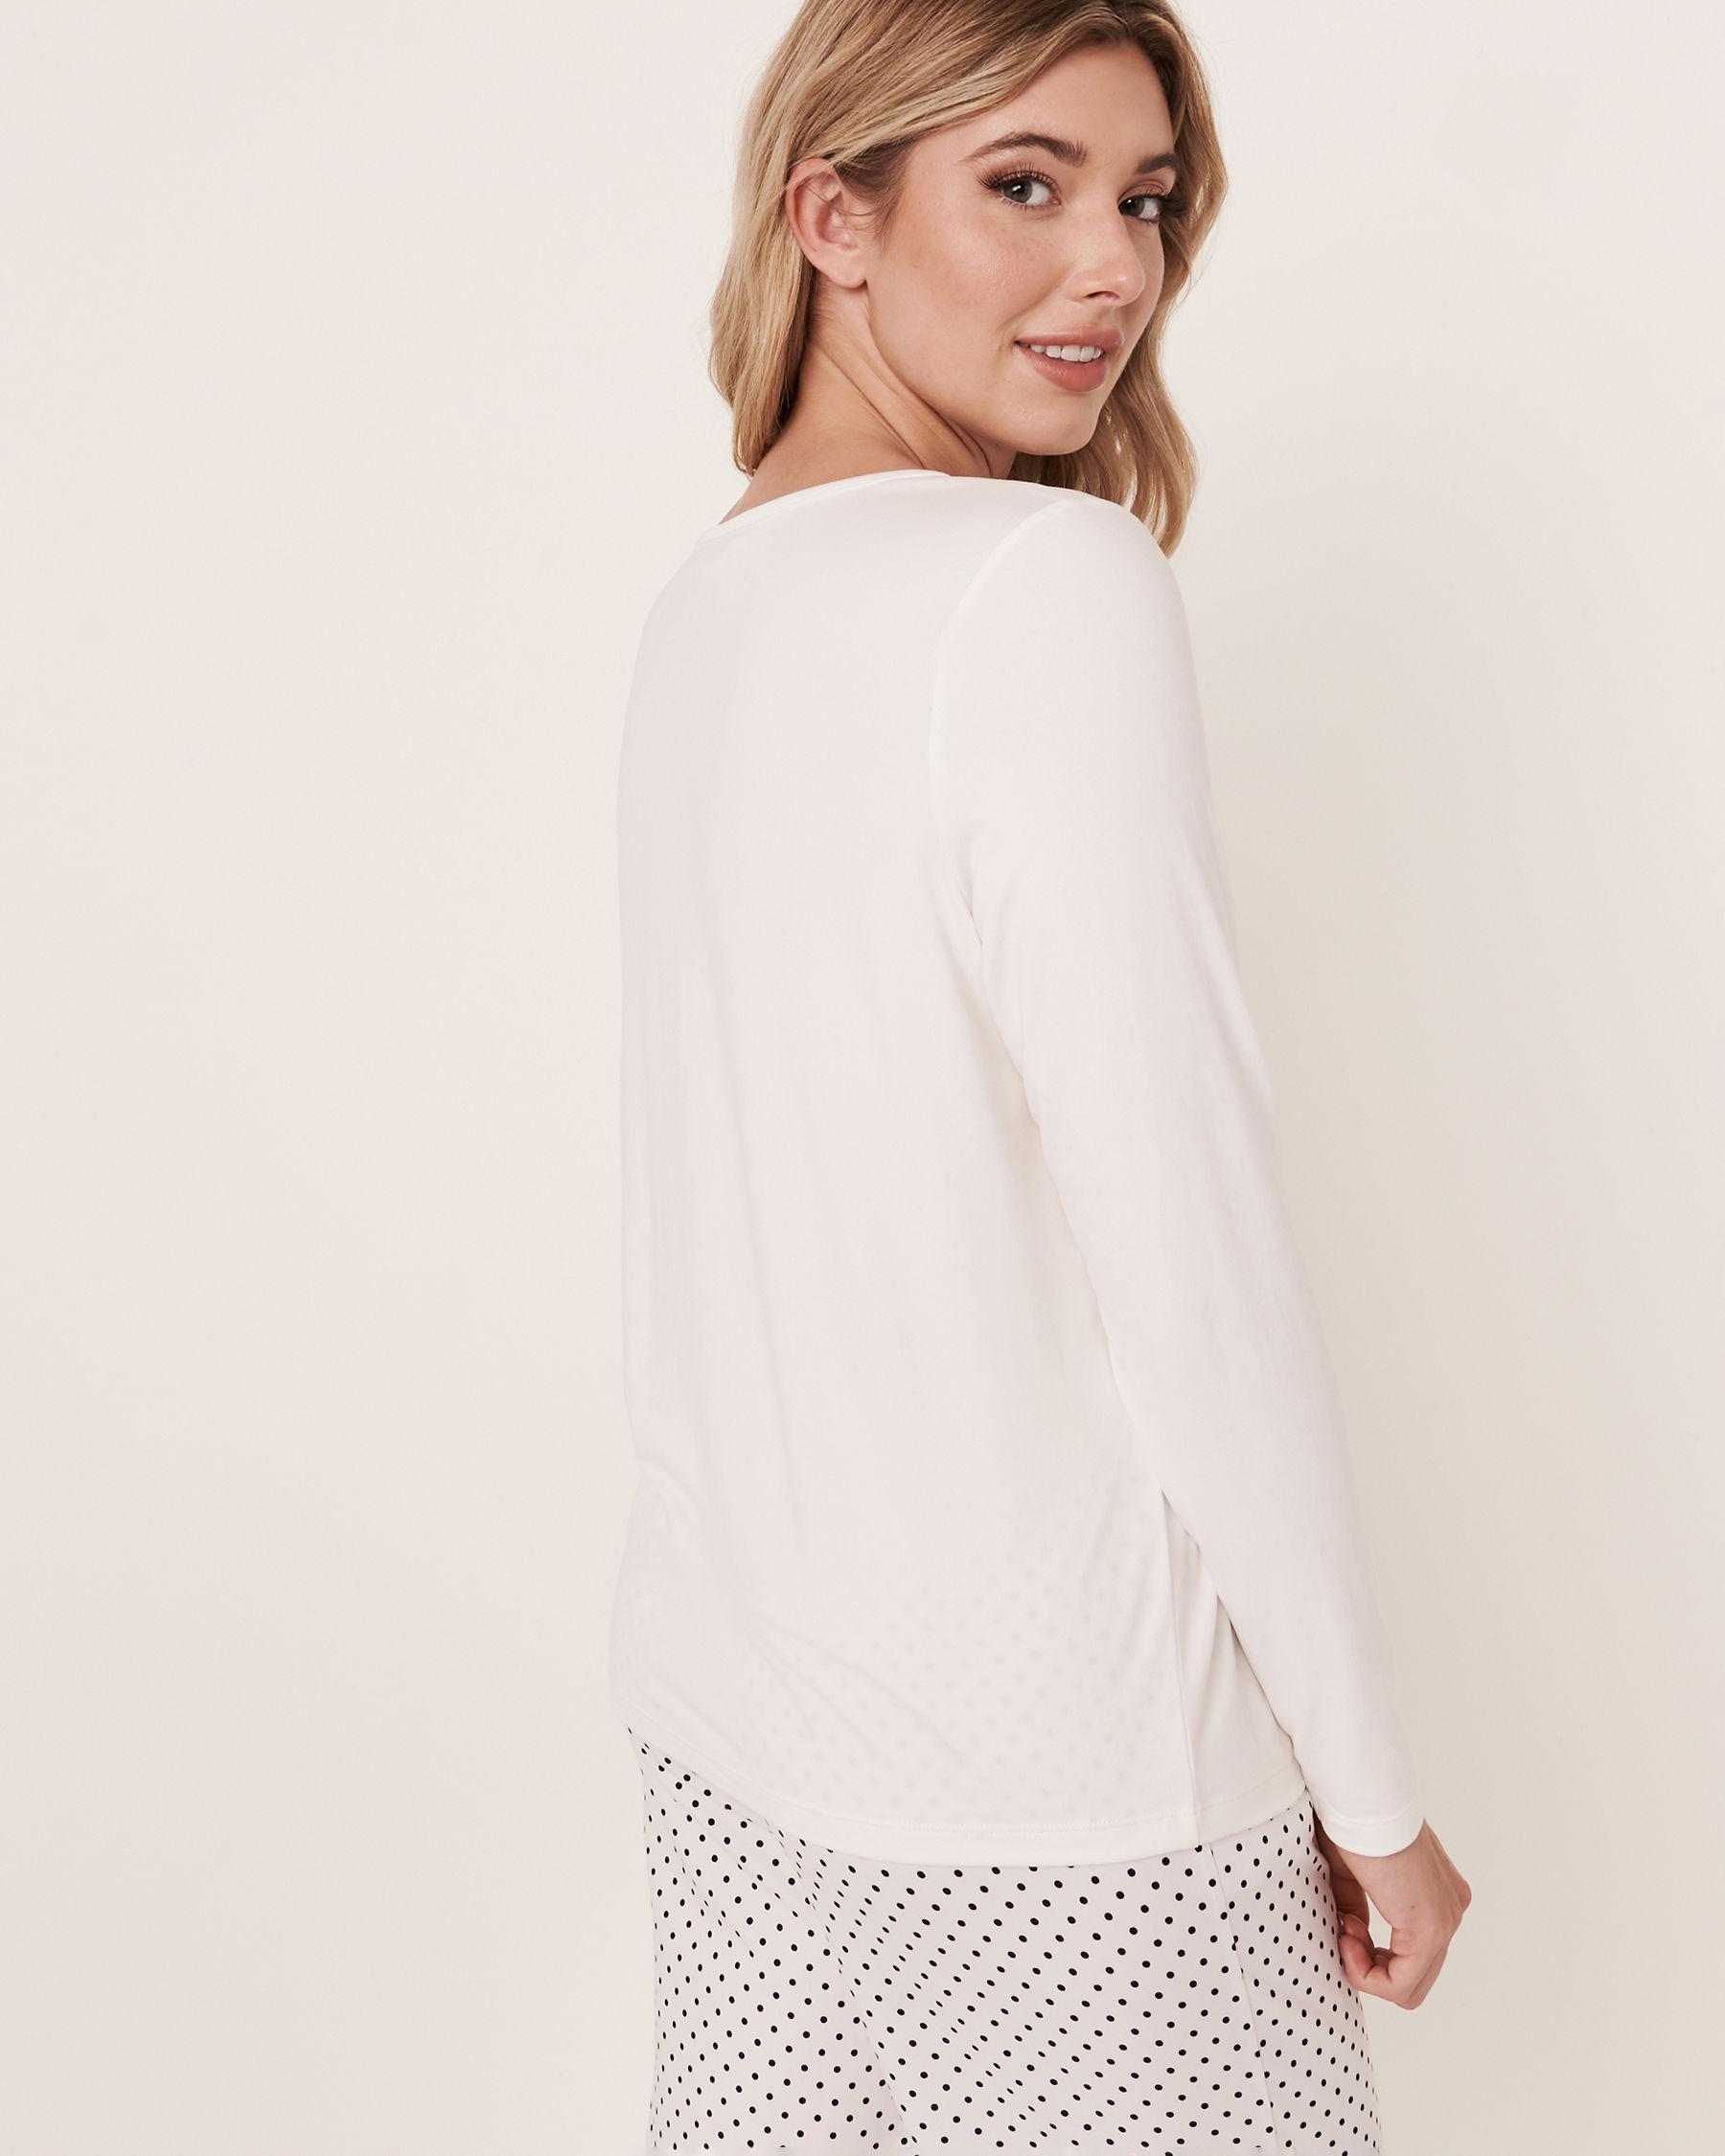 LA VIE EN ROSE Scoop Neck Long Sleeve Shirt White 40100089 - View2